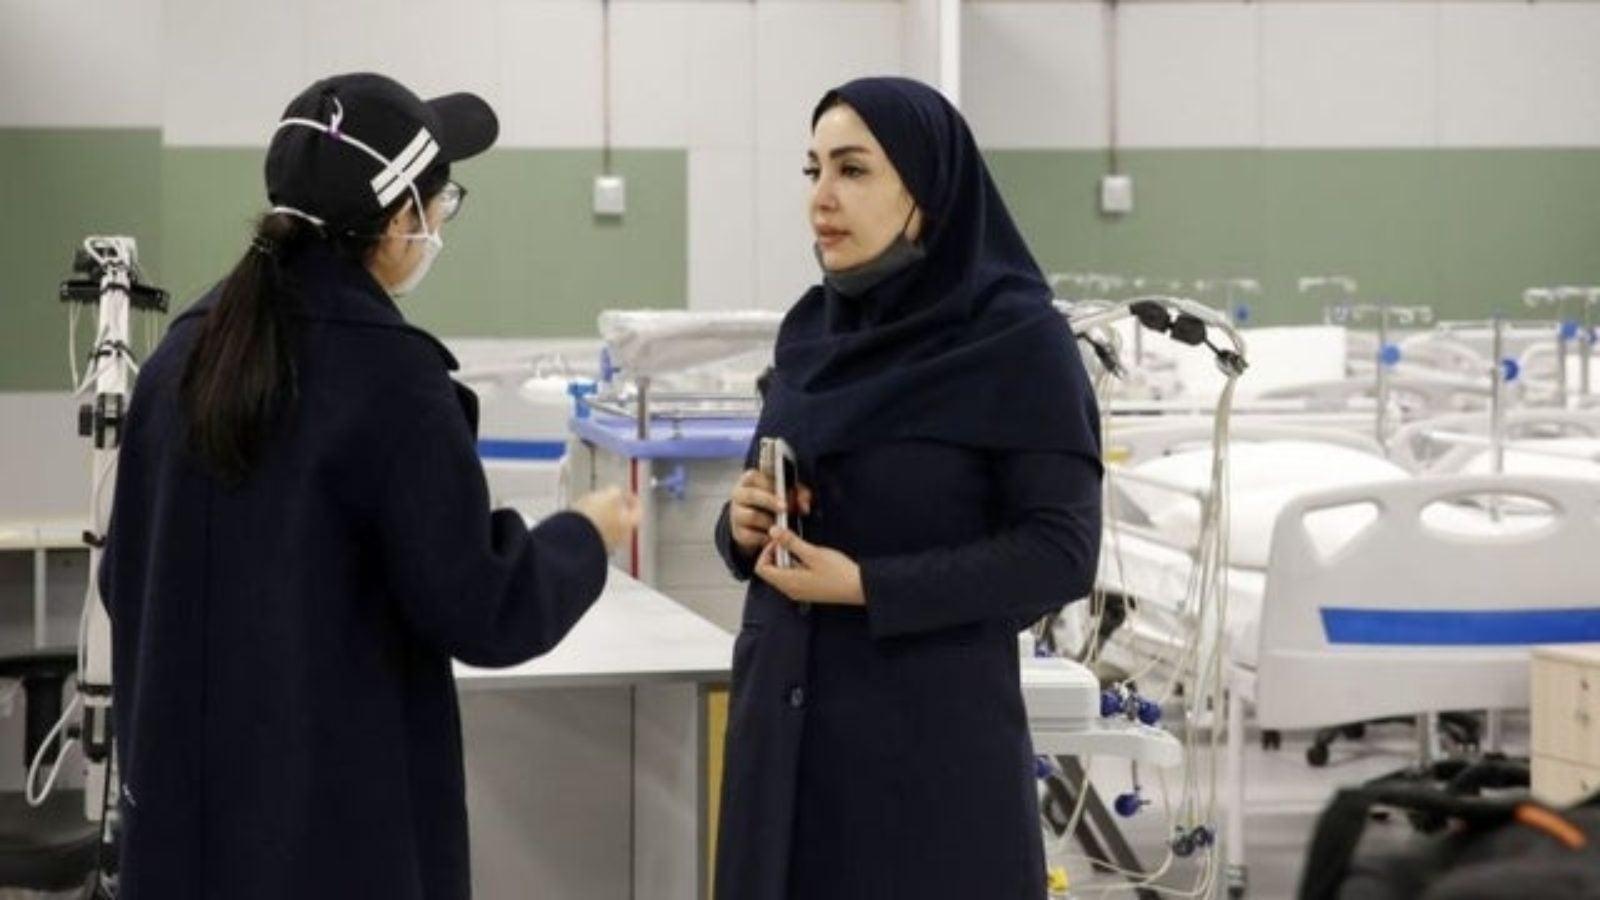 Women in black clothing speak in front of empty hospital beds